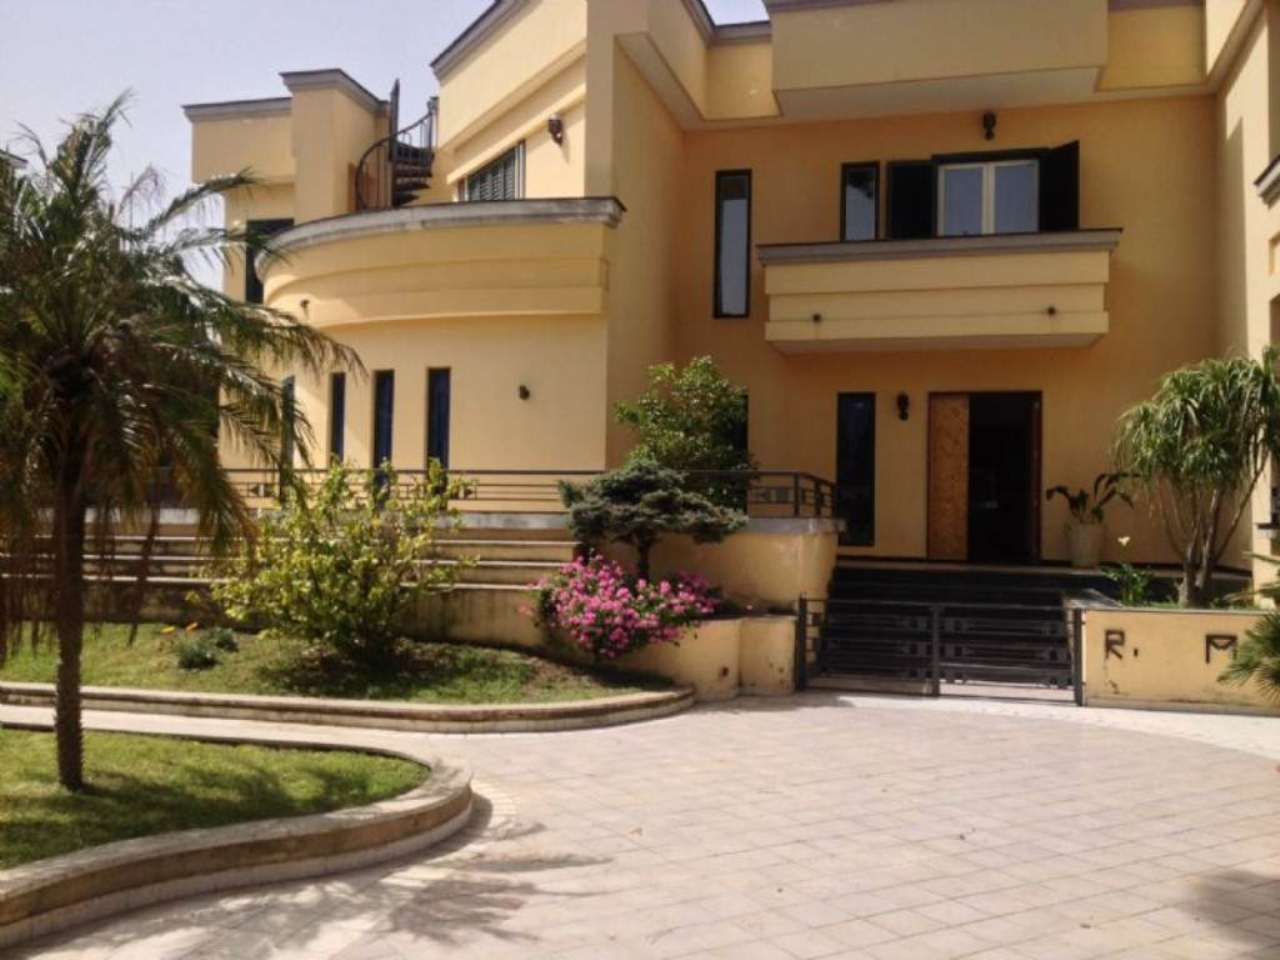 Villa in Vendita a Angri